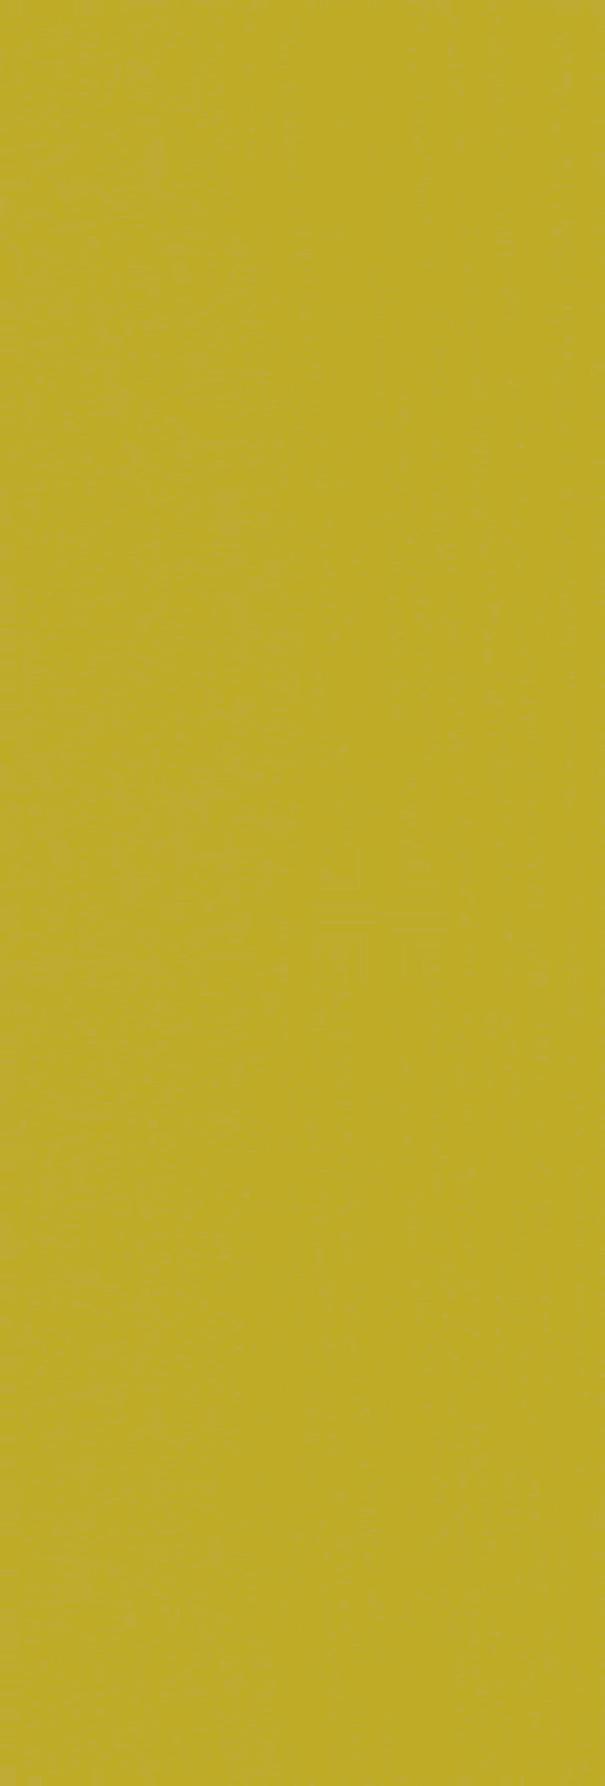 "Yellow ""blanding art"" background for photo"